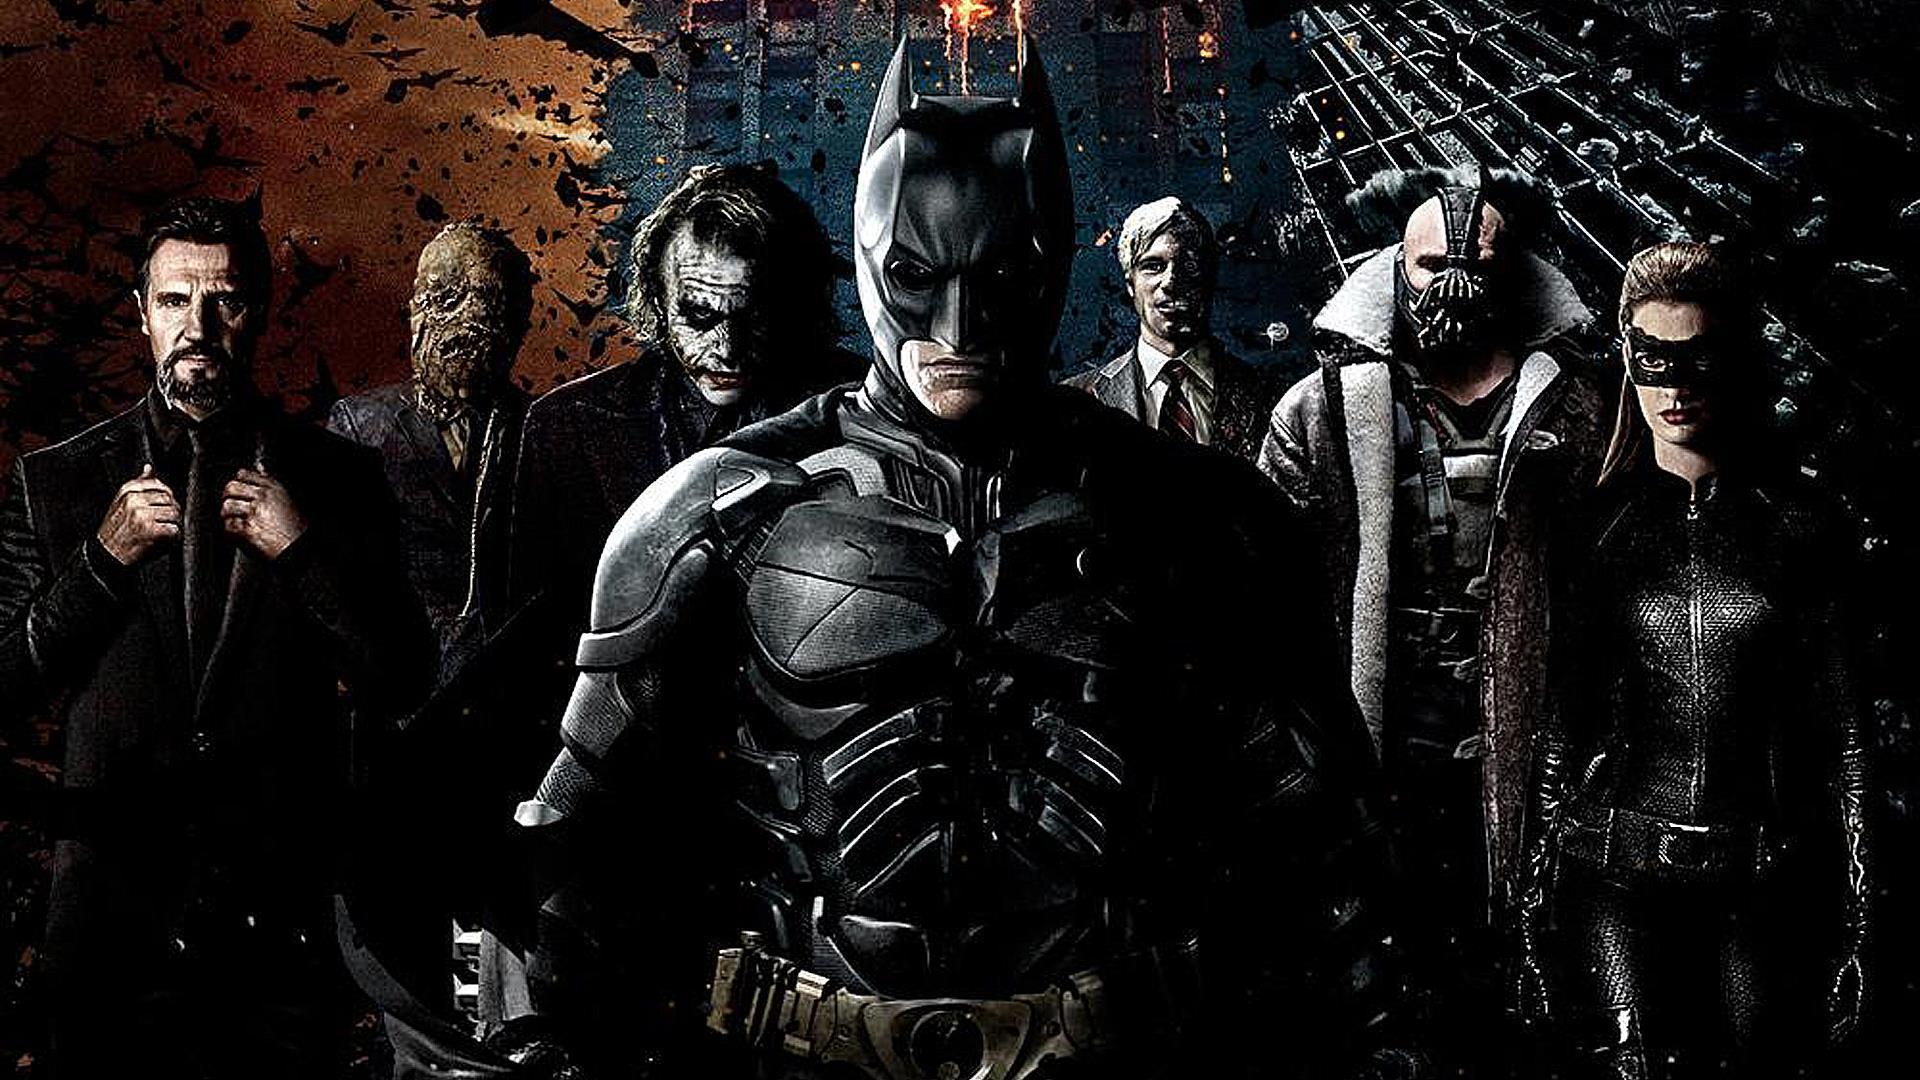 Dark Knight Wallpapers Top Free Dark Knight Backgrounds